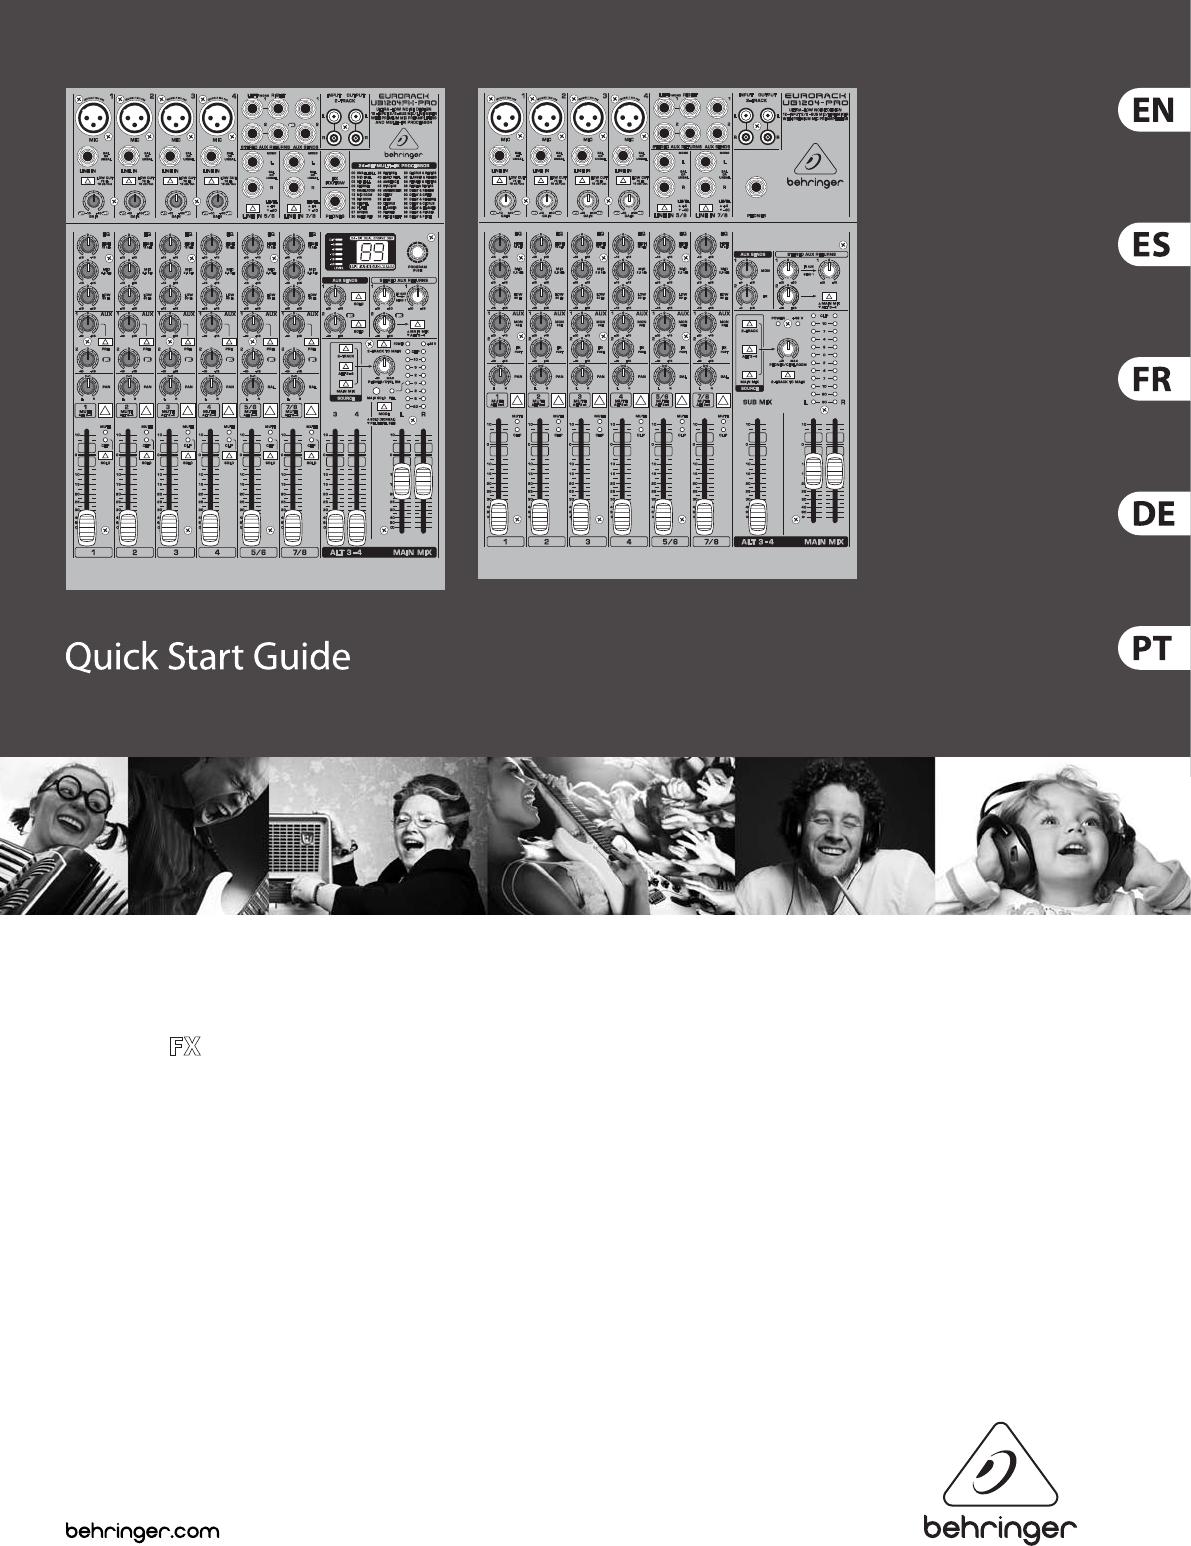 Behringer Europack Ub1204 Pro Quick Start Manual Eurorack Ub1204fx